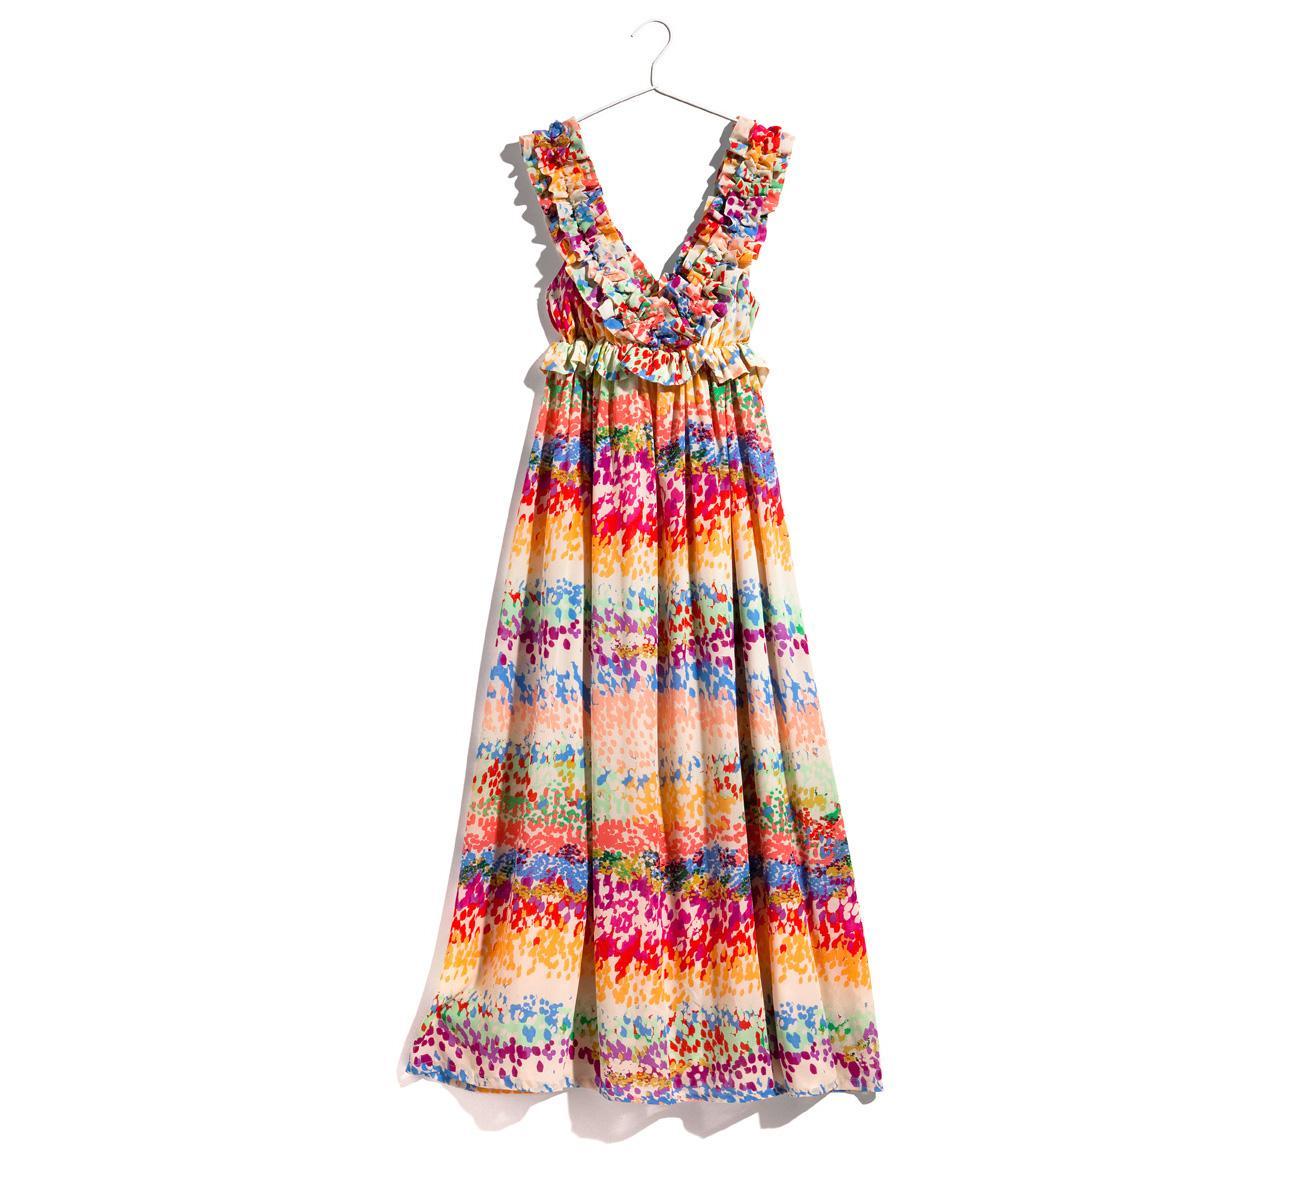 Модные сшитые сарафаны